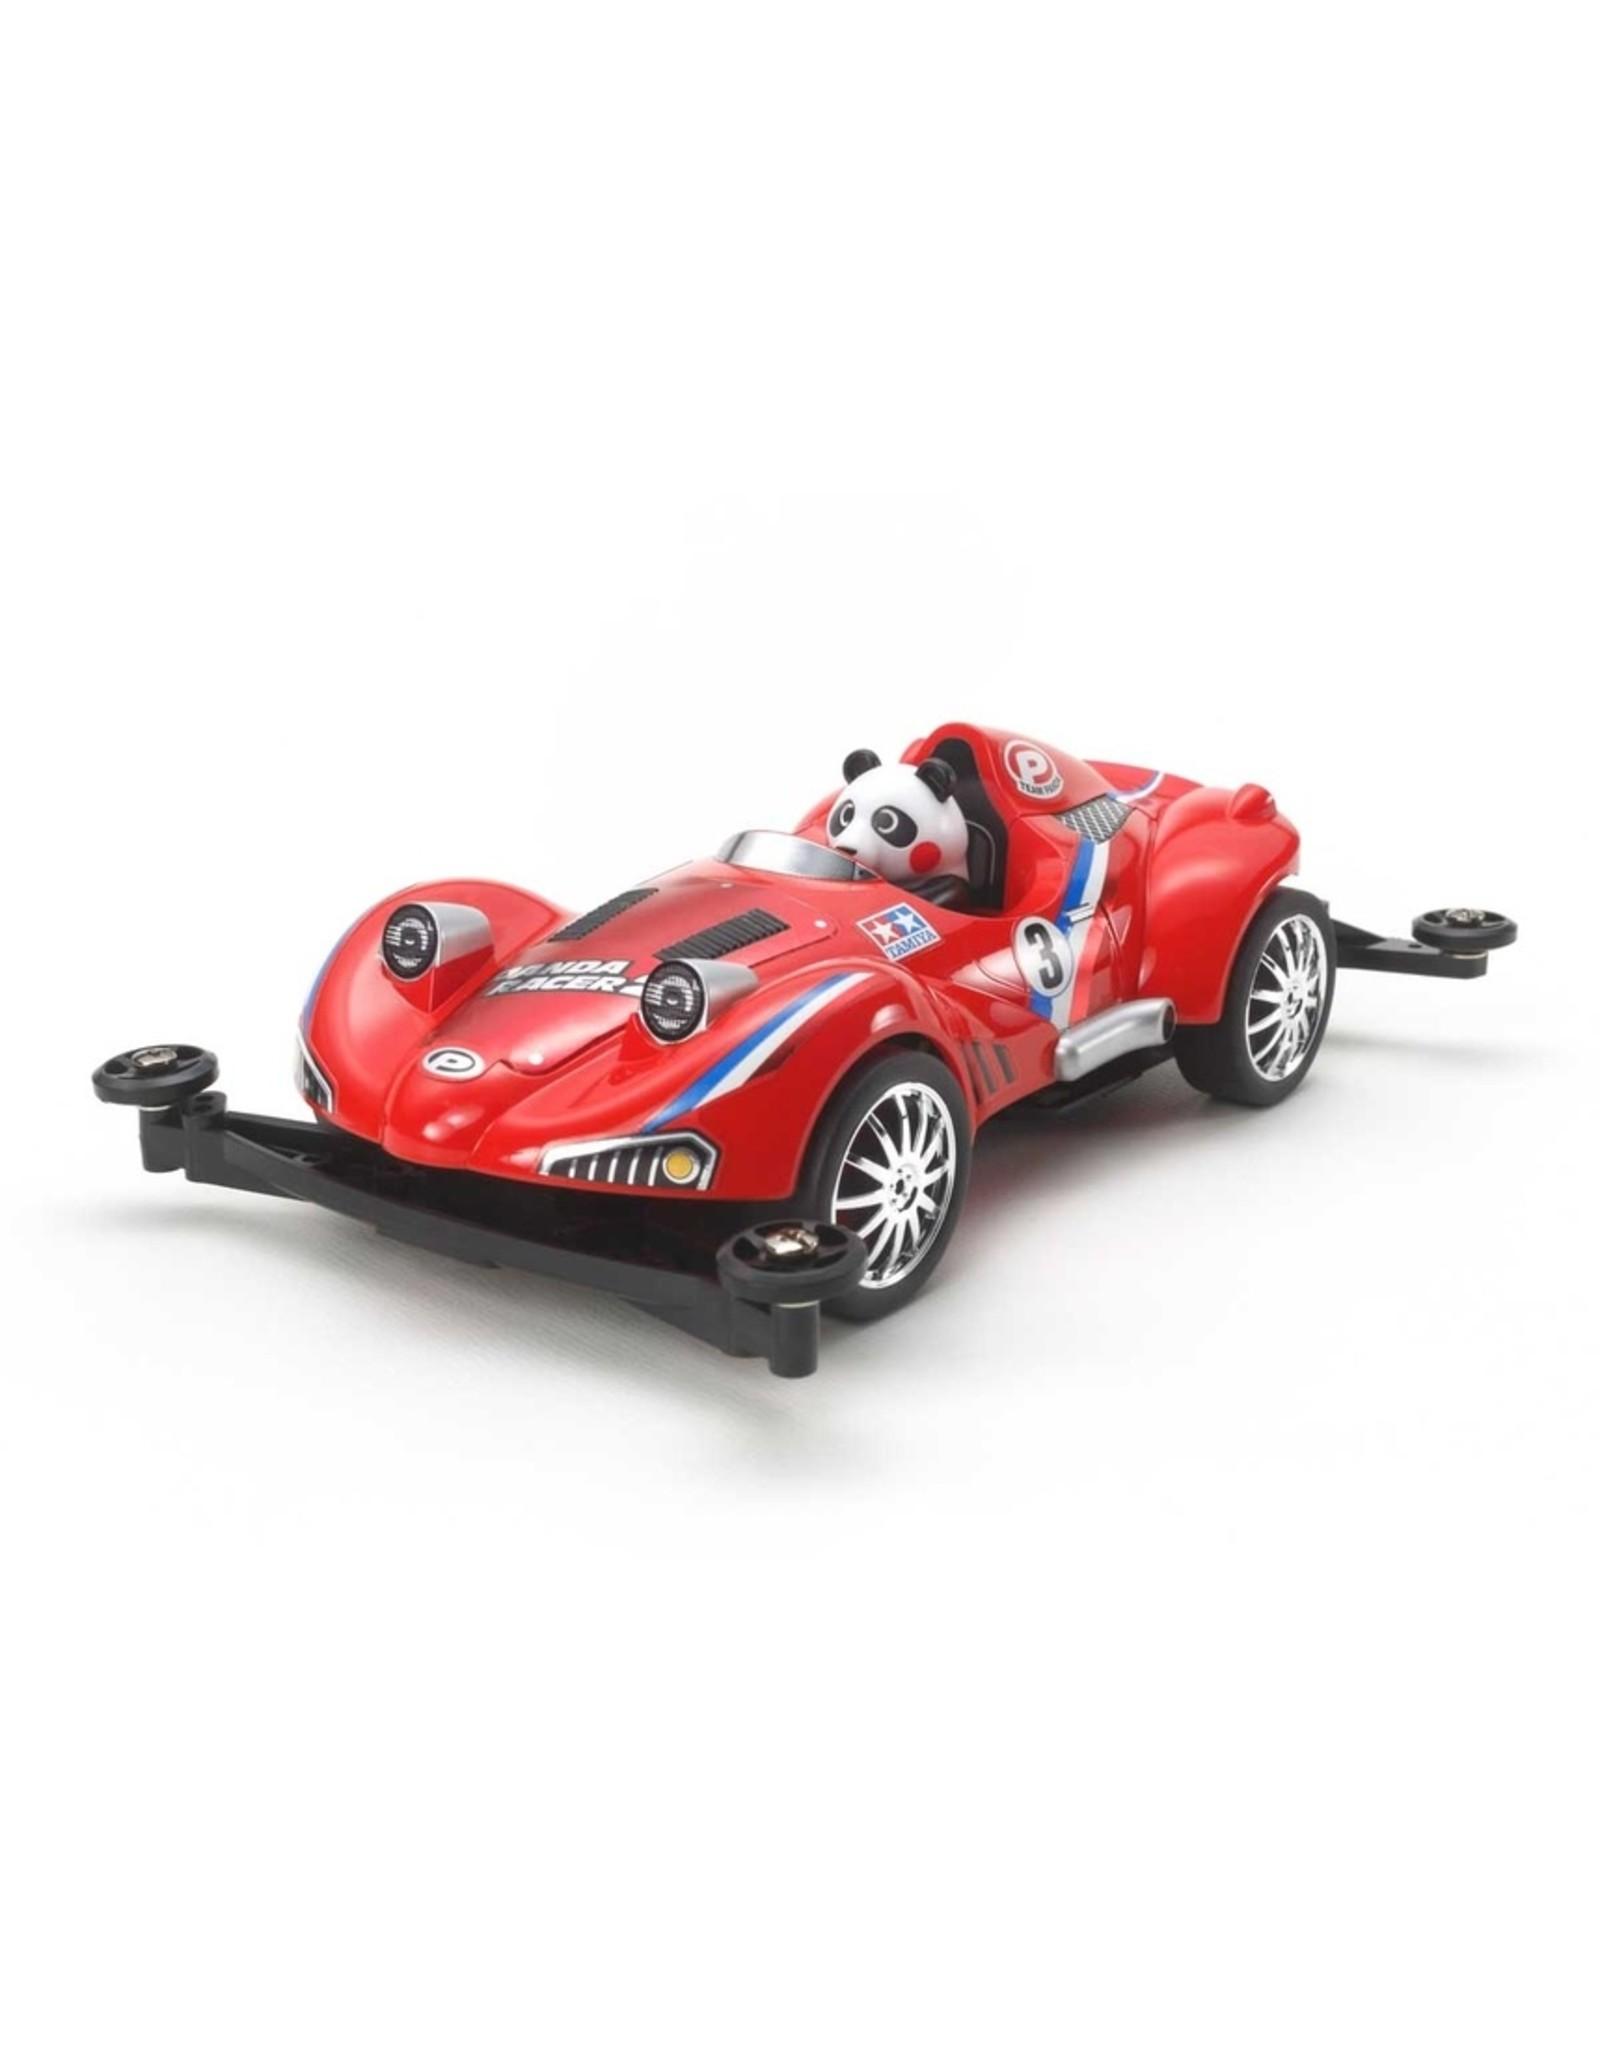 Tamiya JR Panda Racer 2 - FULLY-BUILT